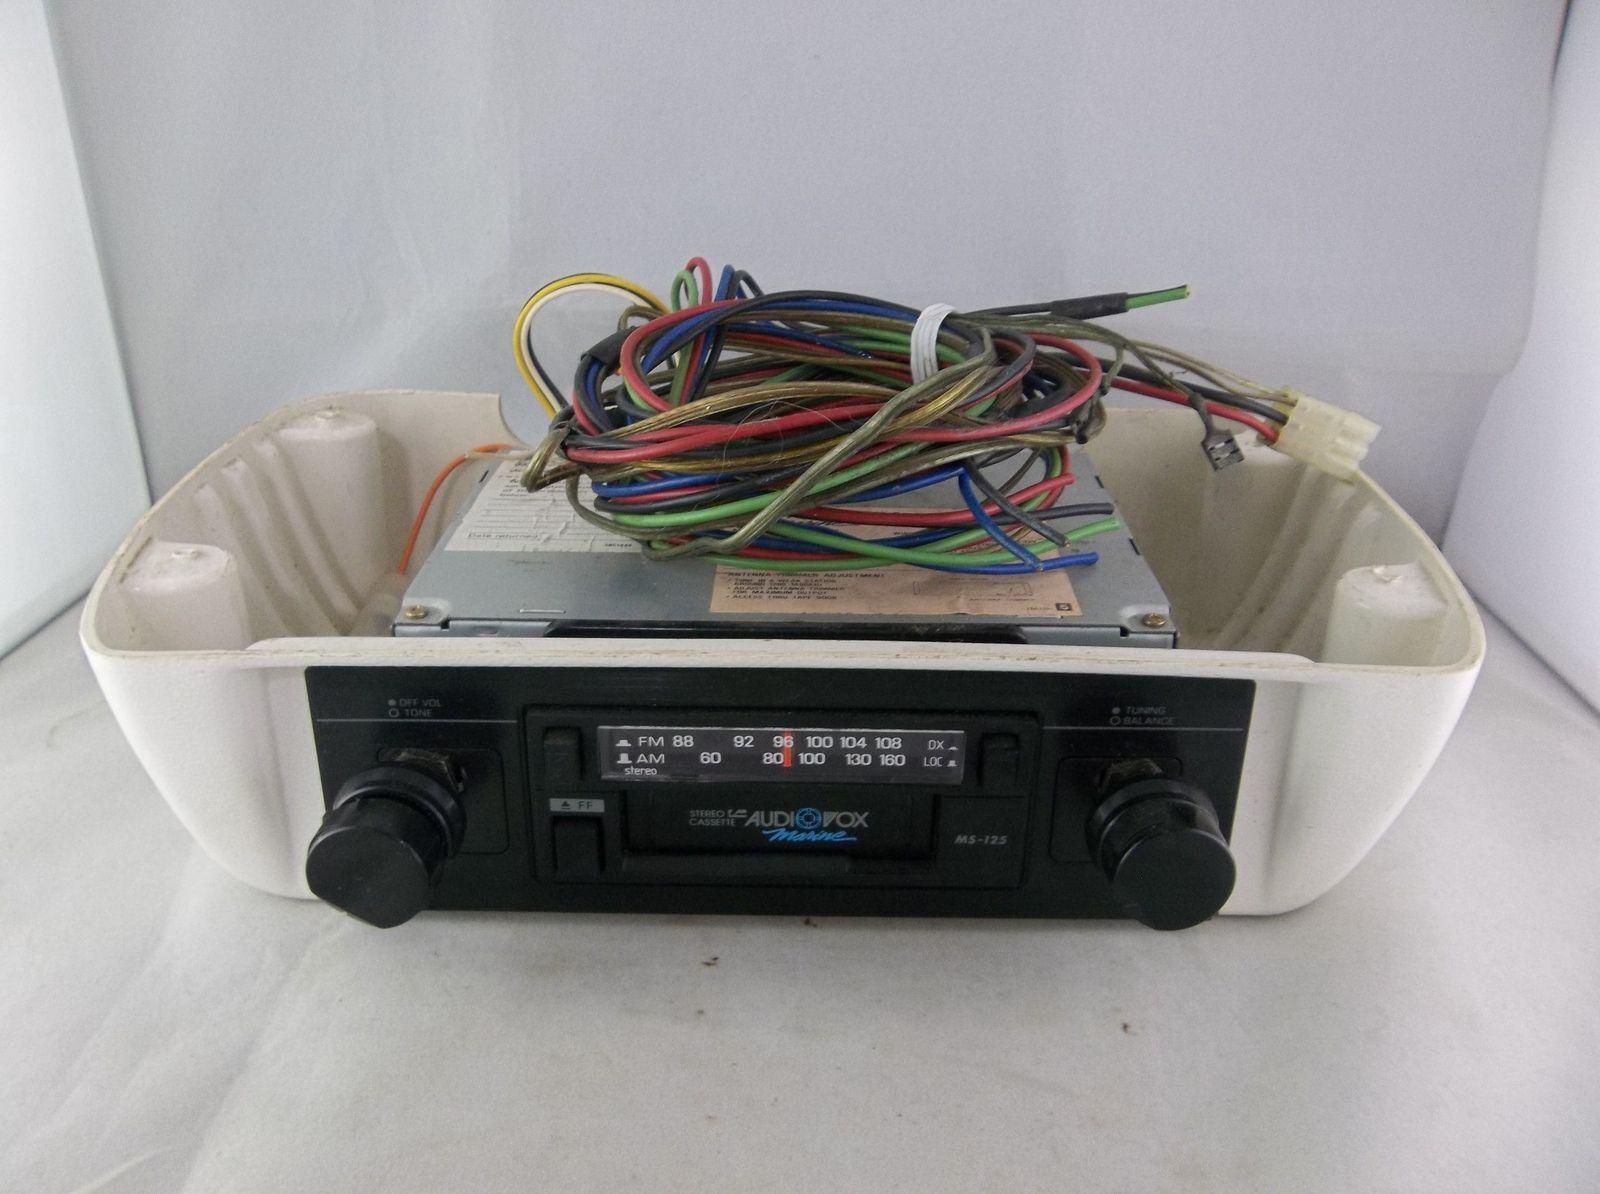 Vintage Audiovox Marine Ms 125 Am Fm Stereo Cassette Player Radio Audiovox Marine Am Fm Cassette Player Radio S Cassette Marine Radios Cassette Player